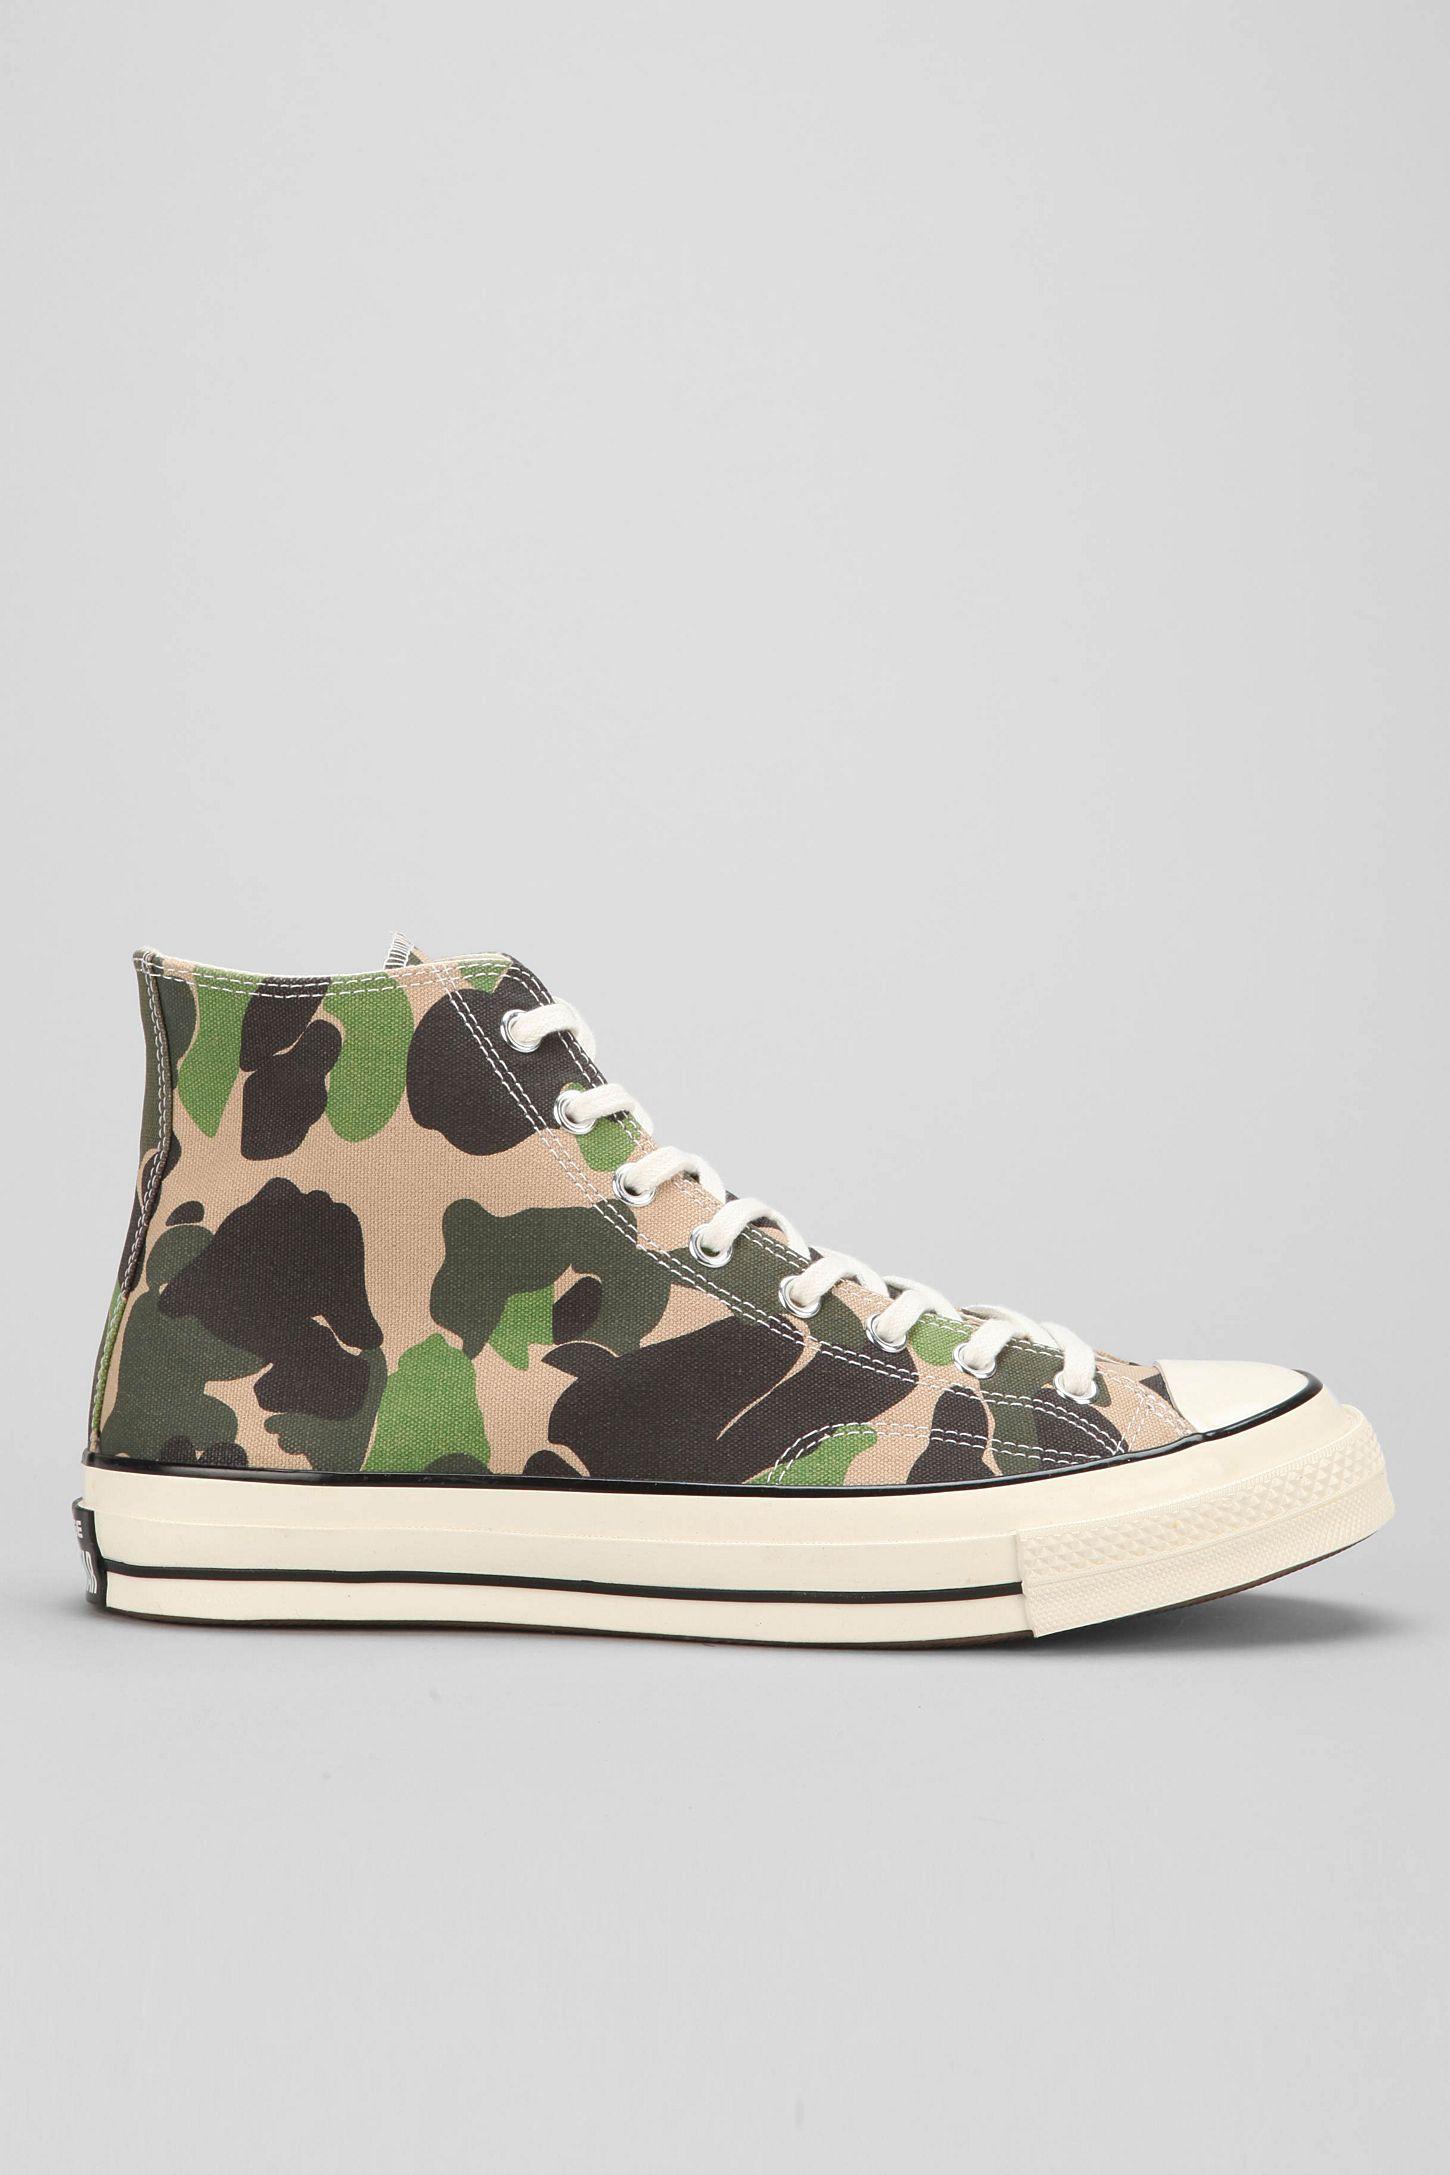 6f4dd7fb35fd Converse Chuck Taylor All Star 70 s Camo High-Top Men s Sneaker ...